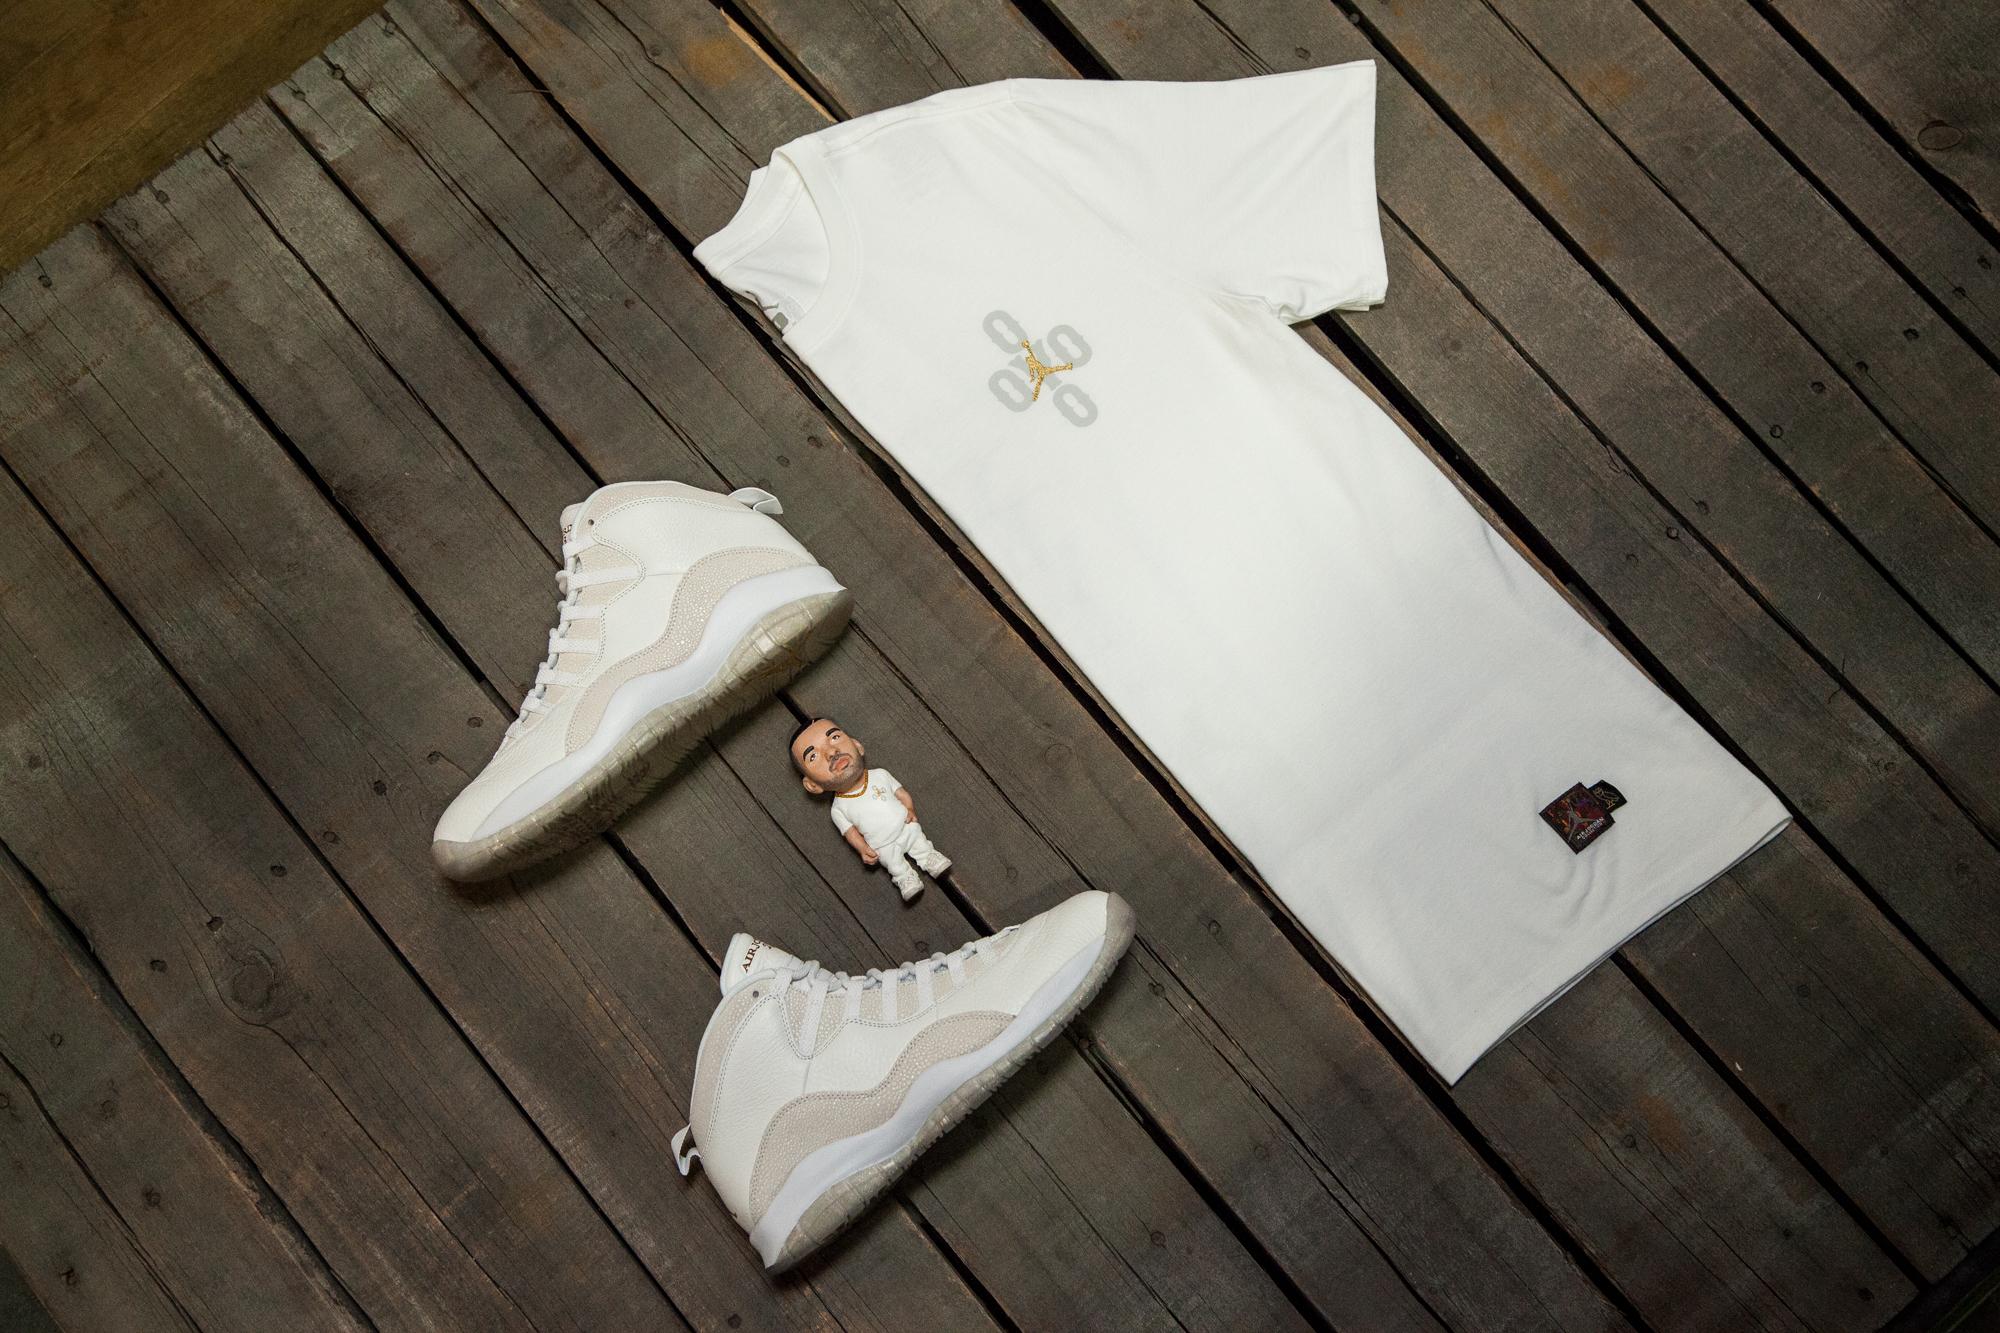 6289c7d0a92531 OVO x Air Jordan 10 T-Shirt and Restock at BAIT